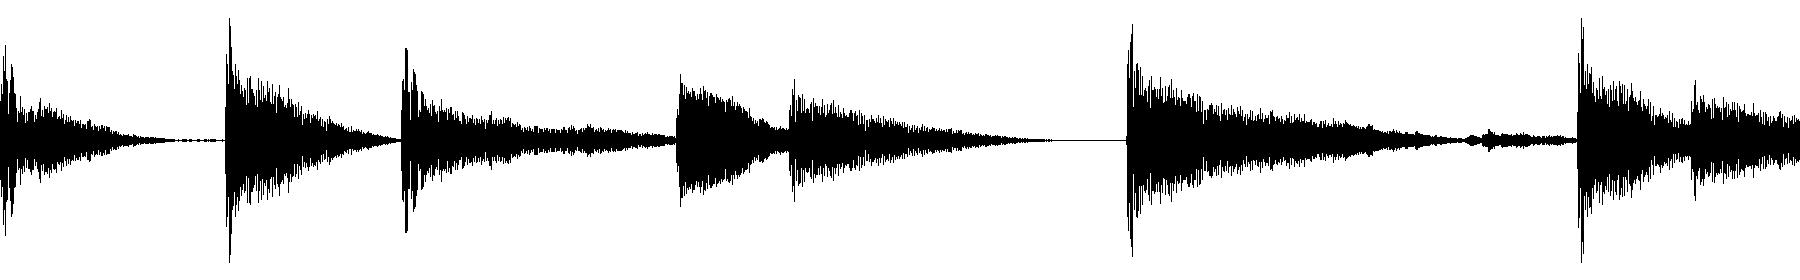 g abs05 105